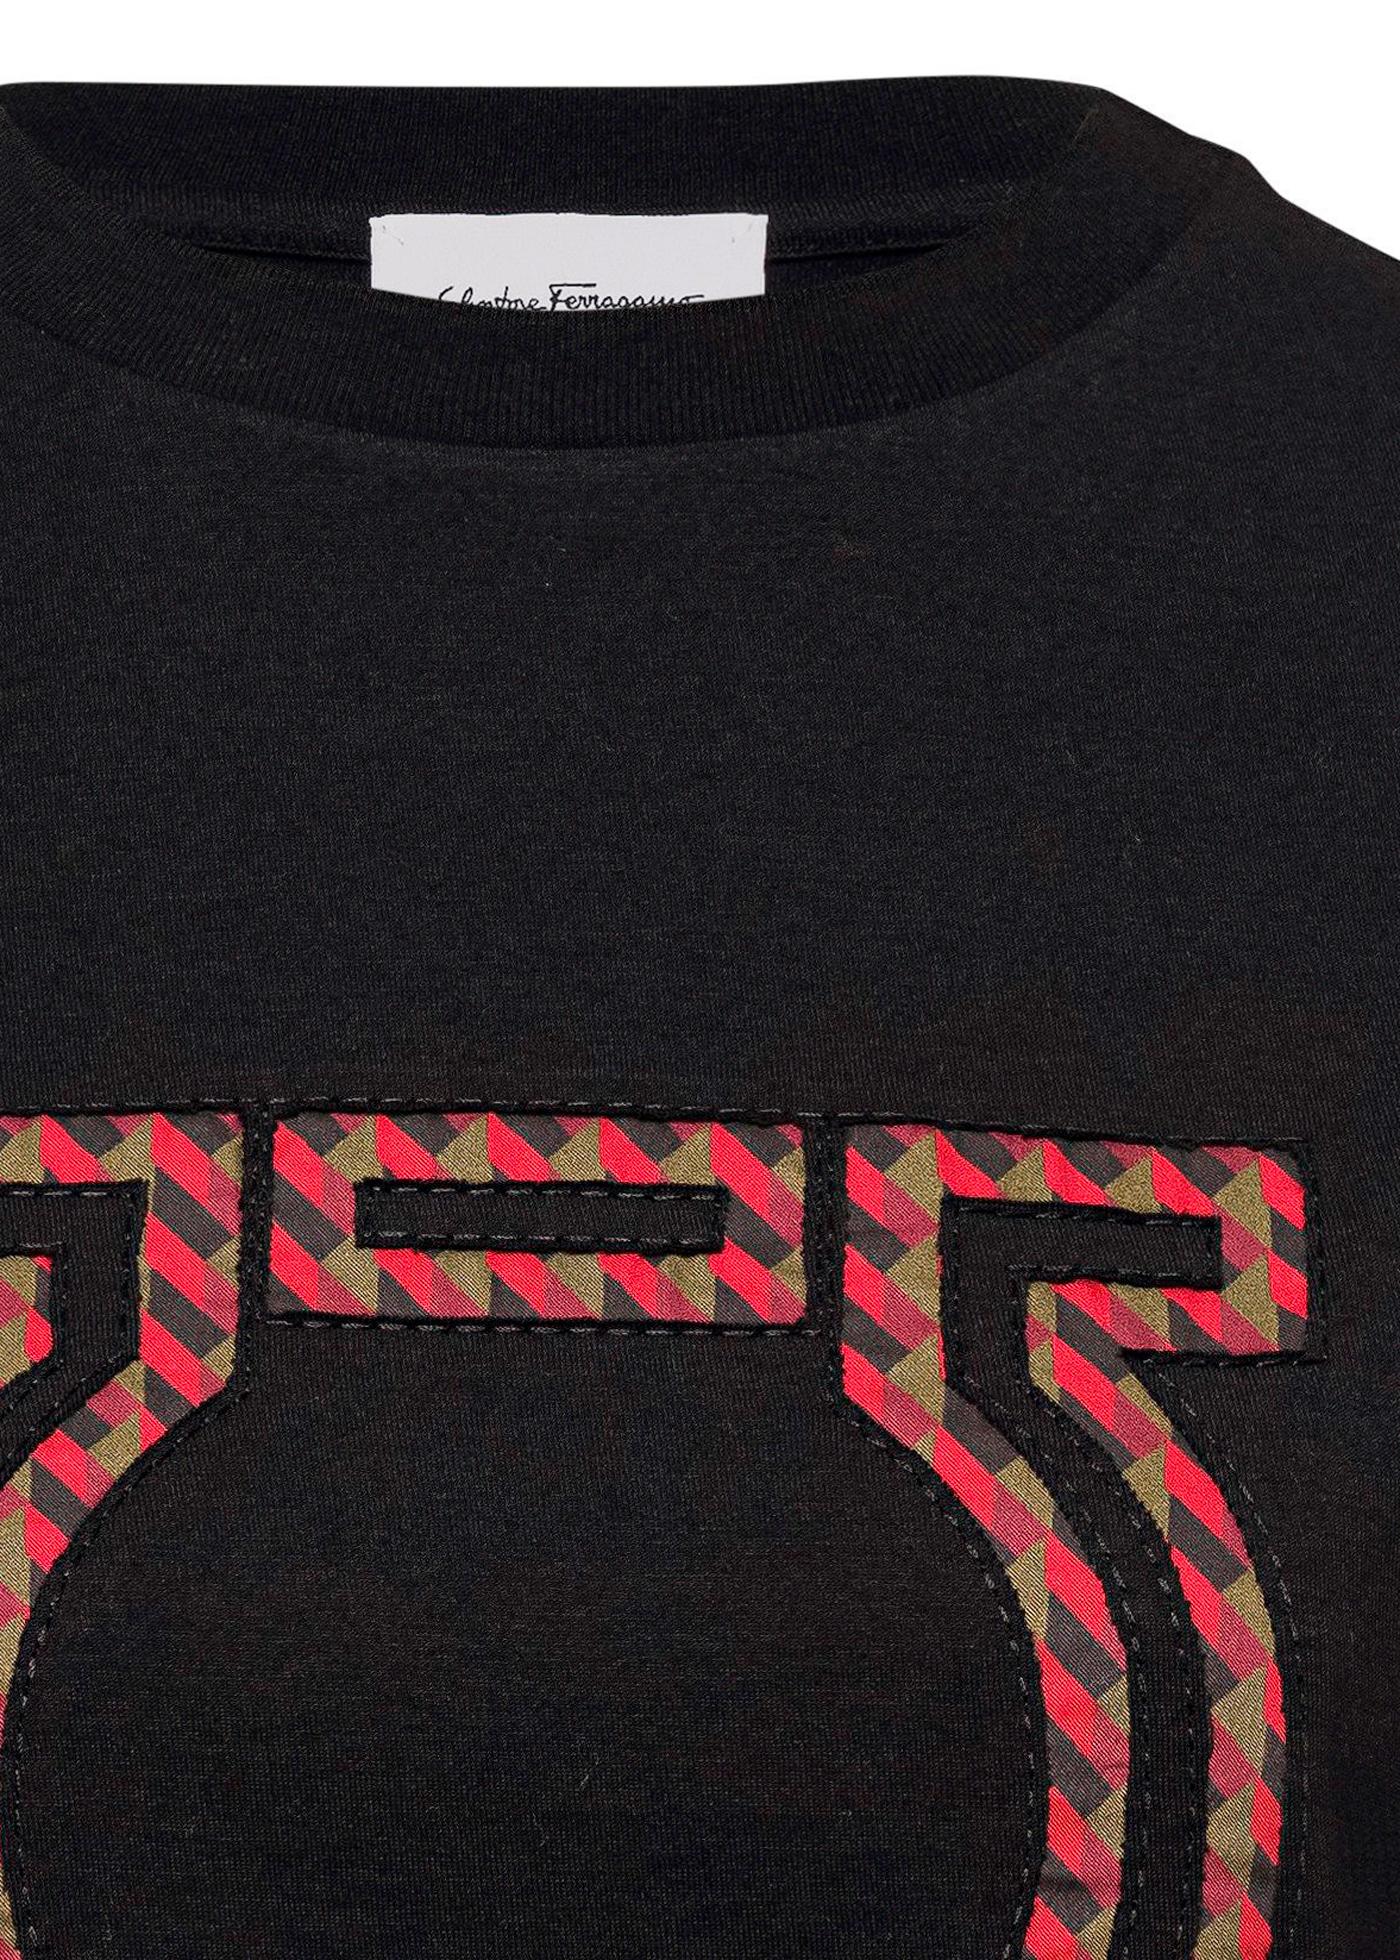 T-shirt manica corta image number 2